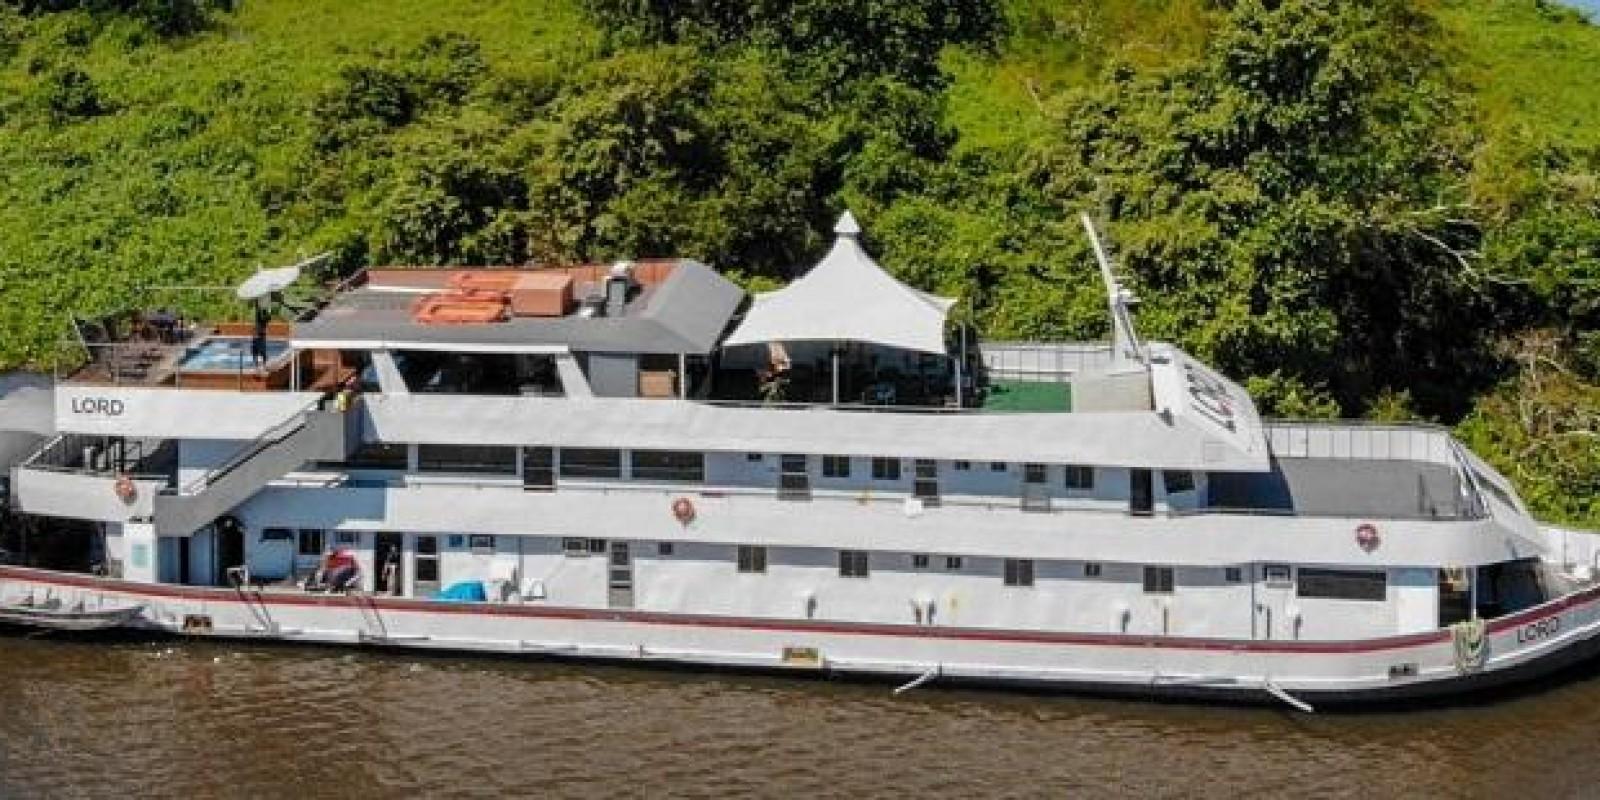 Barco Lord do Pantanal - Corumbá - Rio Paraguai - Foto 11 de 11